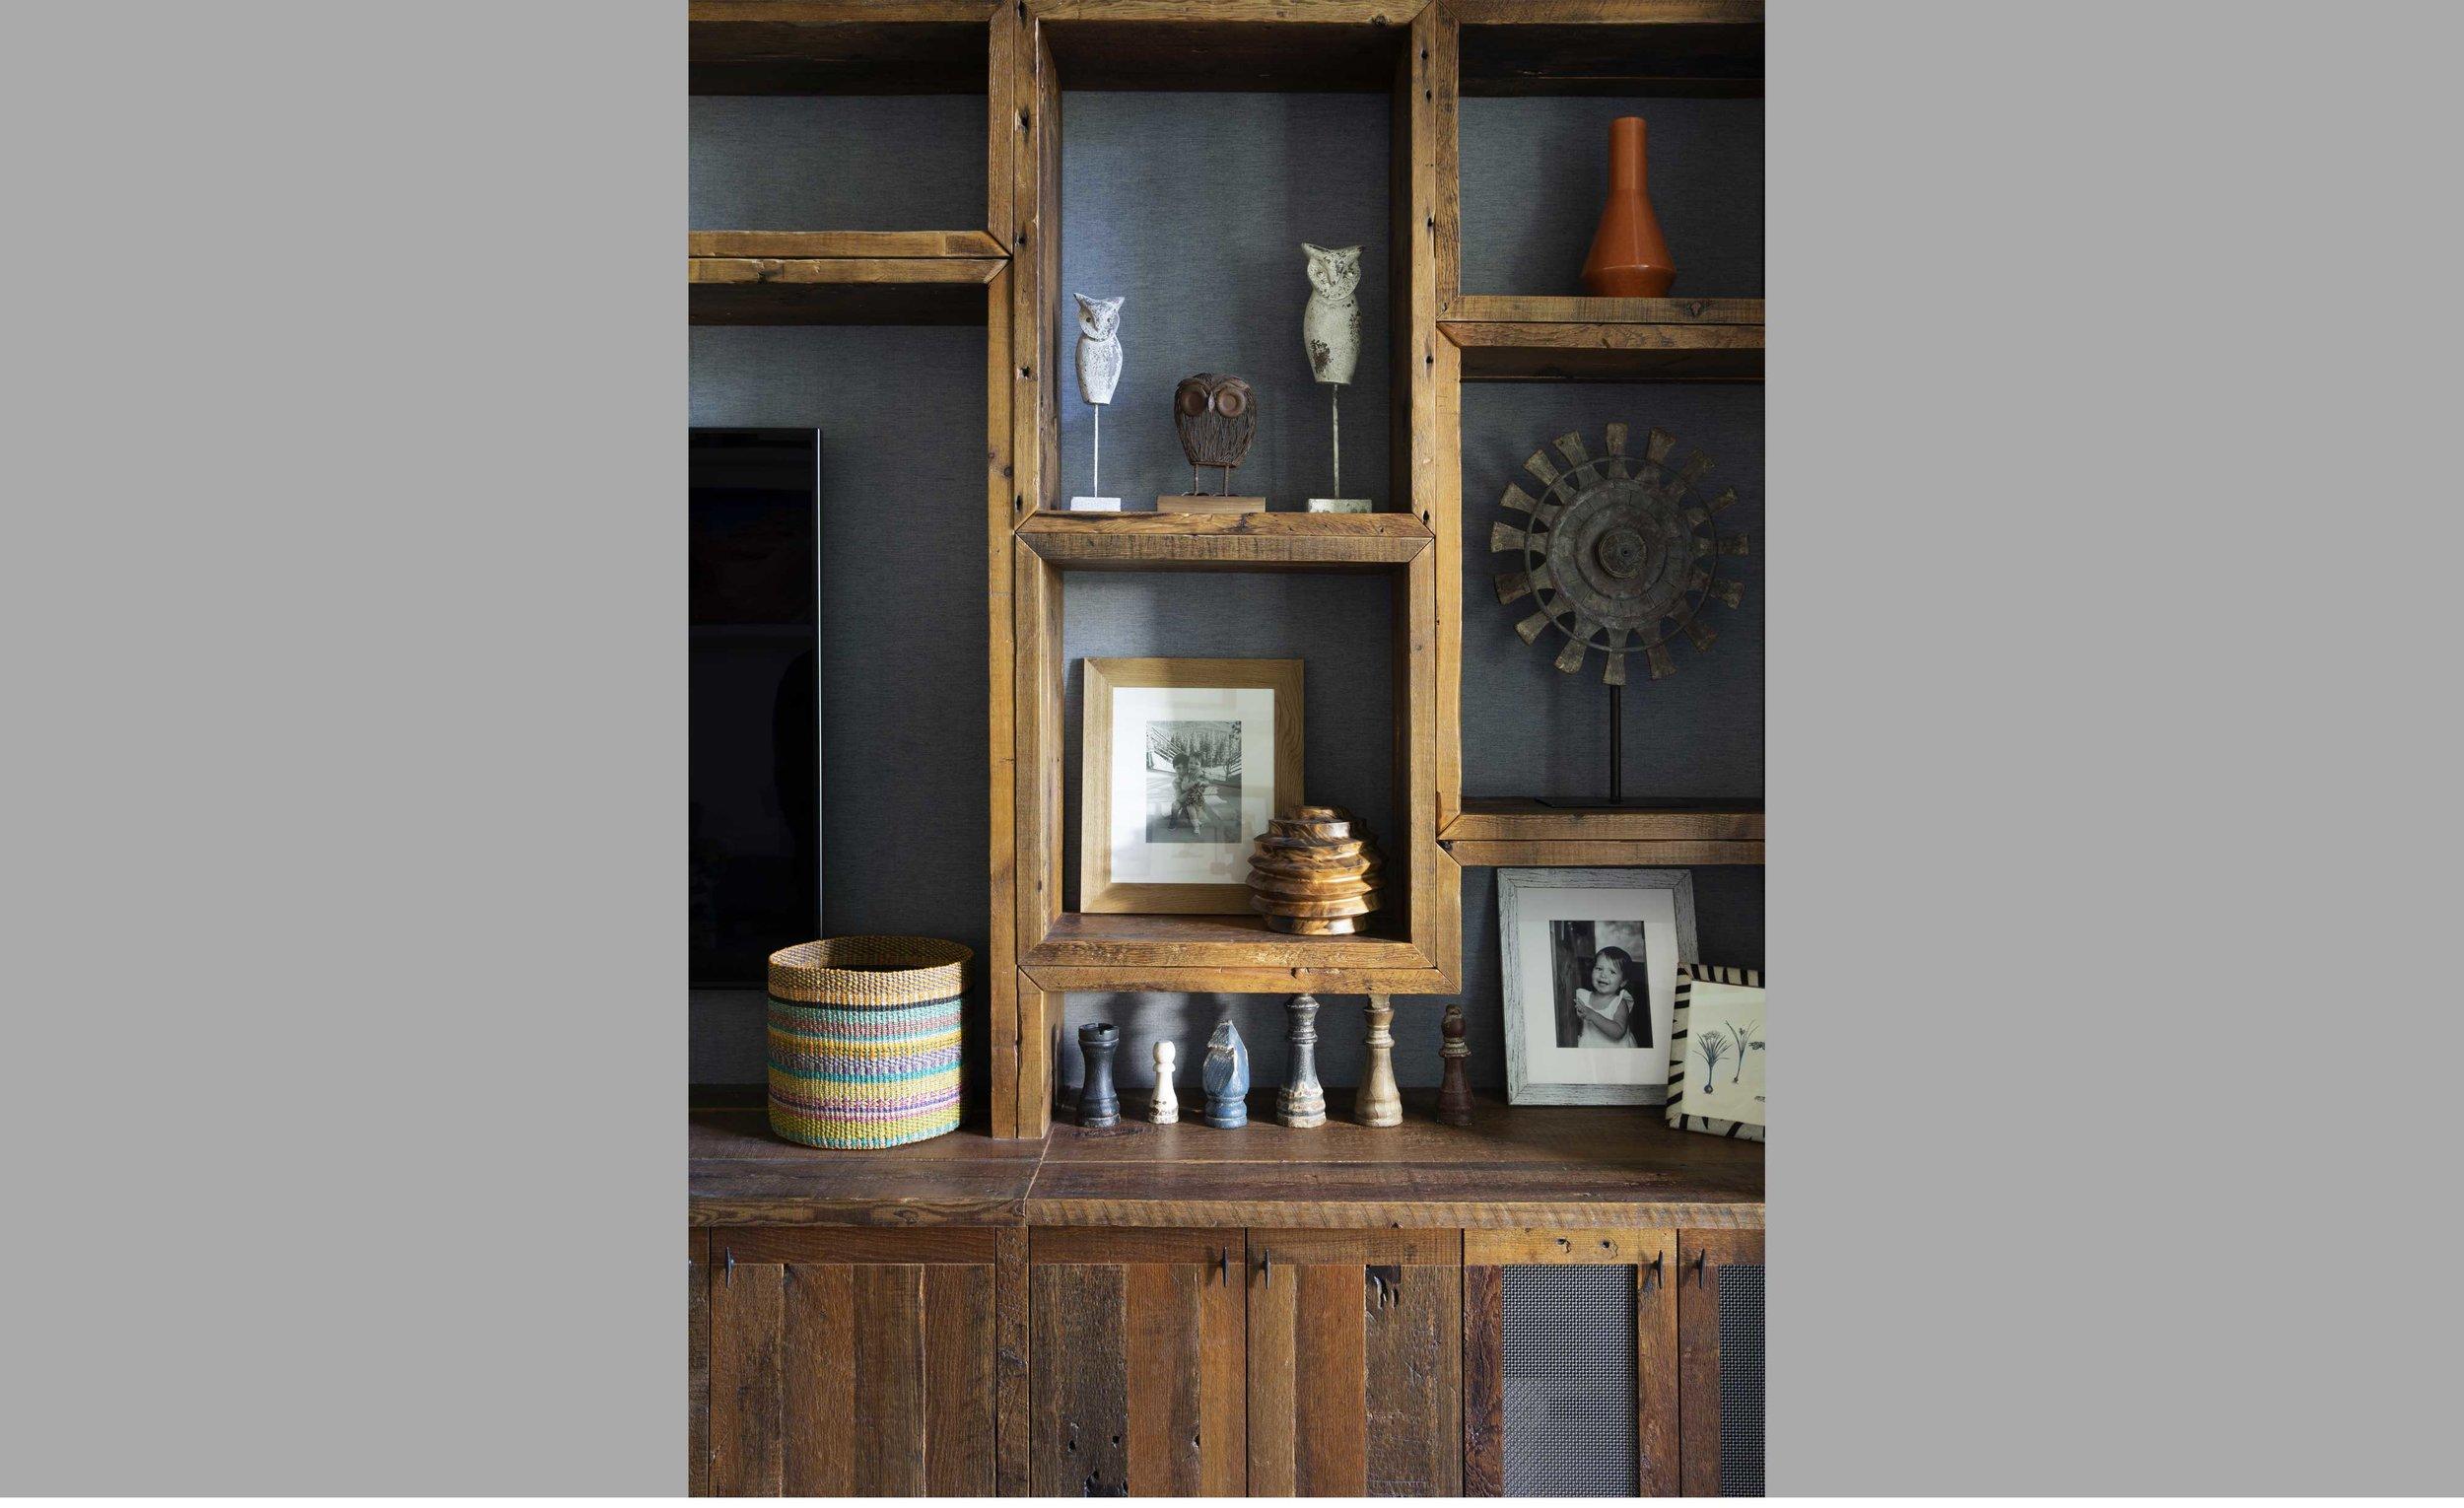 Contractor: Jim Morrison Construction Interiors: Sarah Jones Interior Design + Walton Architecture + Engineering Photography: Paul Dyer Square Footage: 4,245 sf bedrooms: 5 bathrooms: 4.5